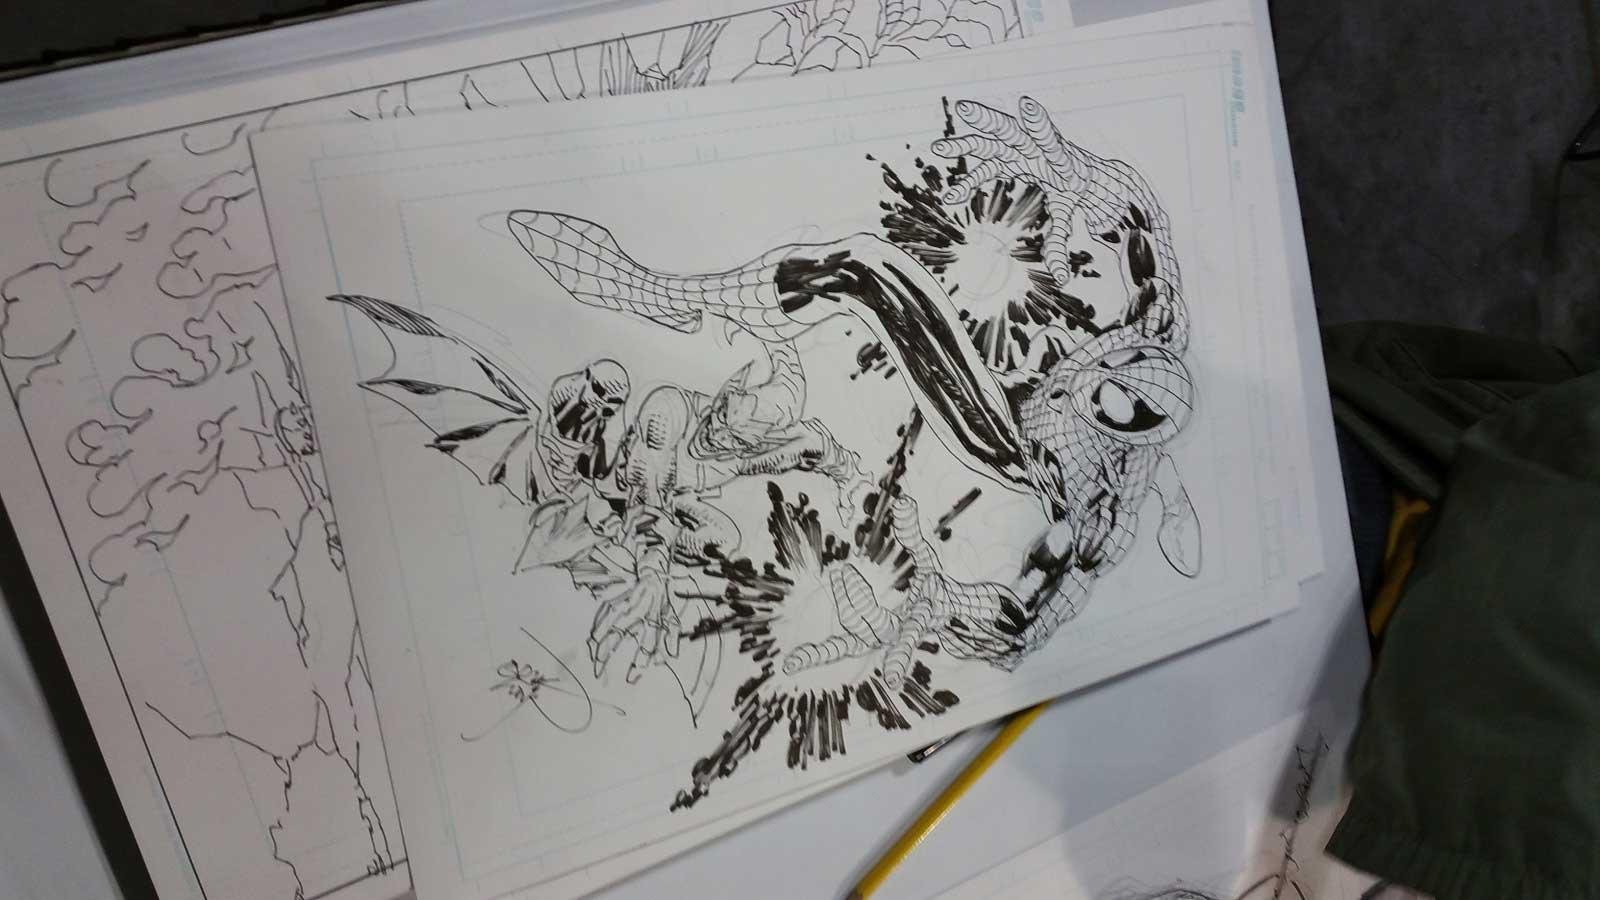 nyc-comiccon-spiderman-artwork-eric-larsen